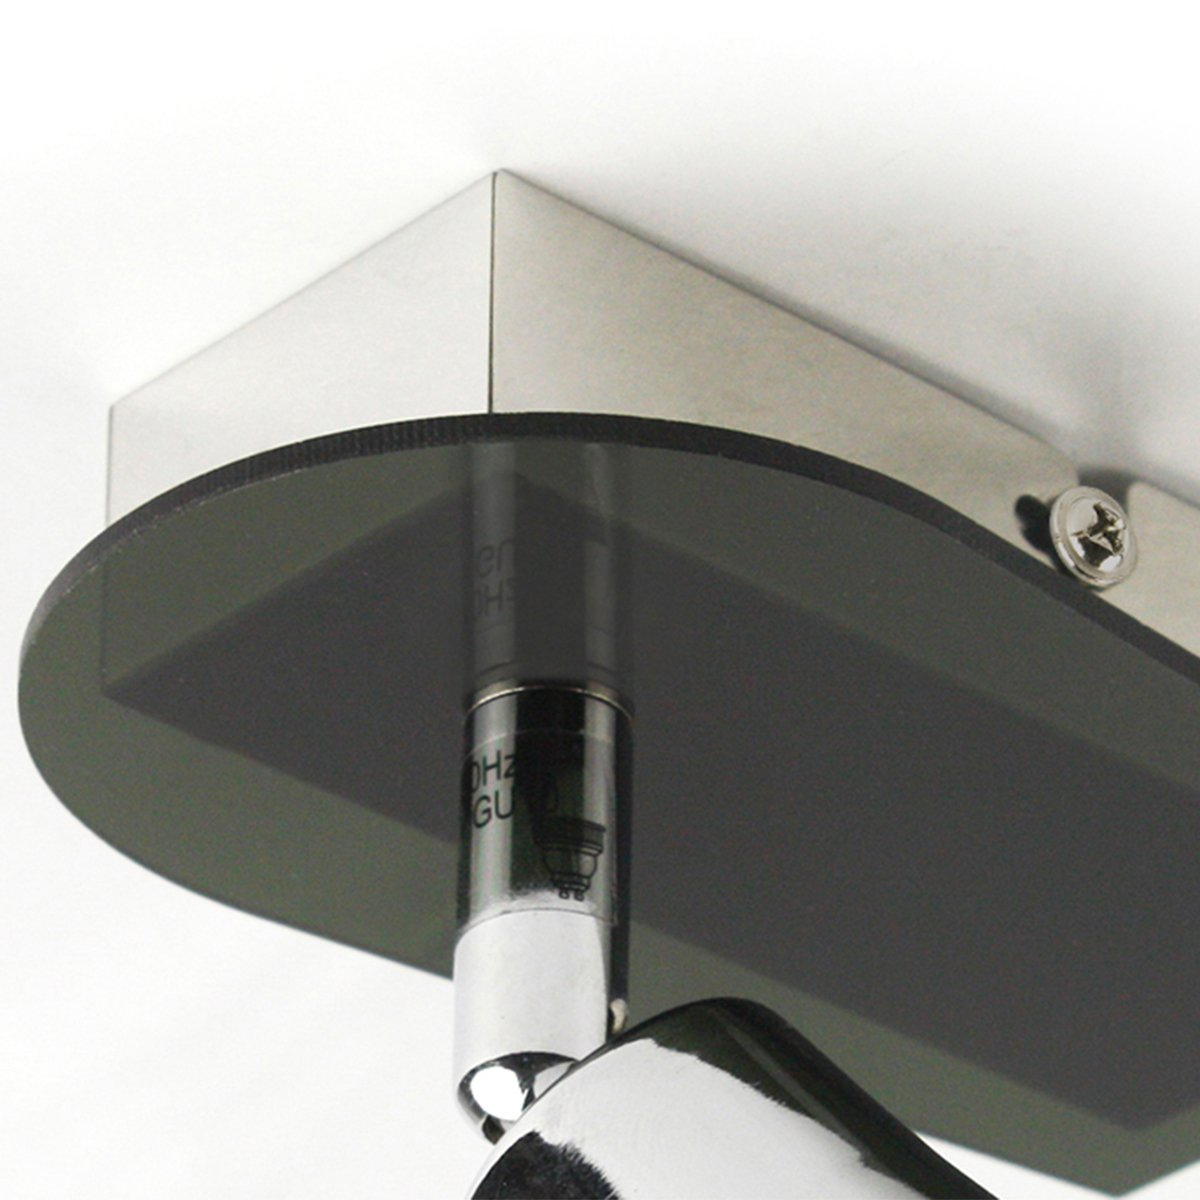 Luz de techo giratorio e inclinable 1 foco cromo GU10 L/ámpara de ahorro de energ/ía que incluye bombilla intercambiable Habitaci/ón Corredor Cocina Dormitorio Iluminaci/ón Montaje f/ácil